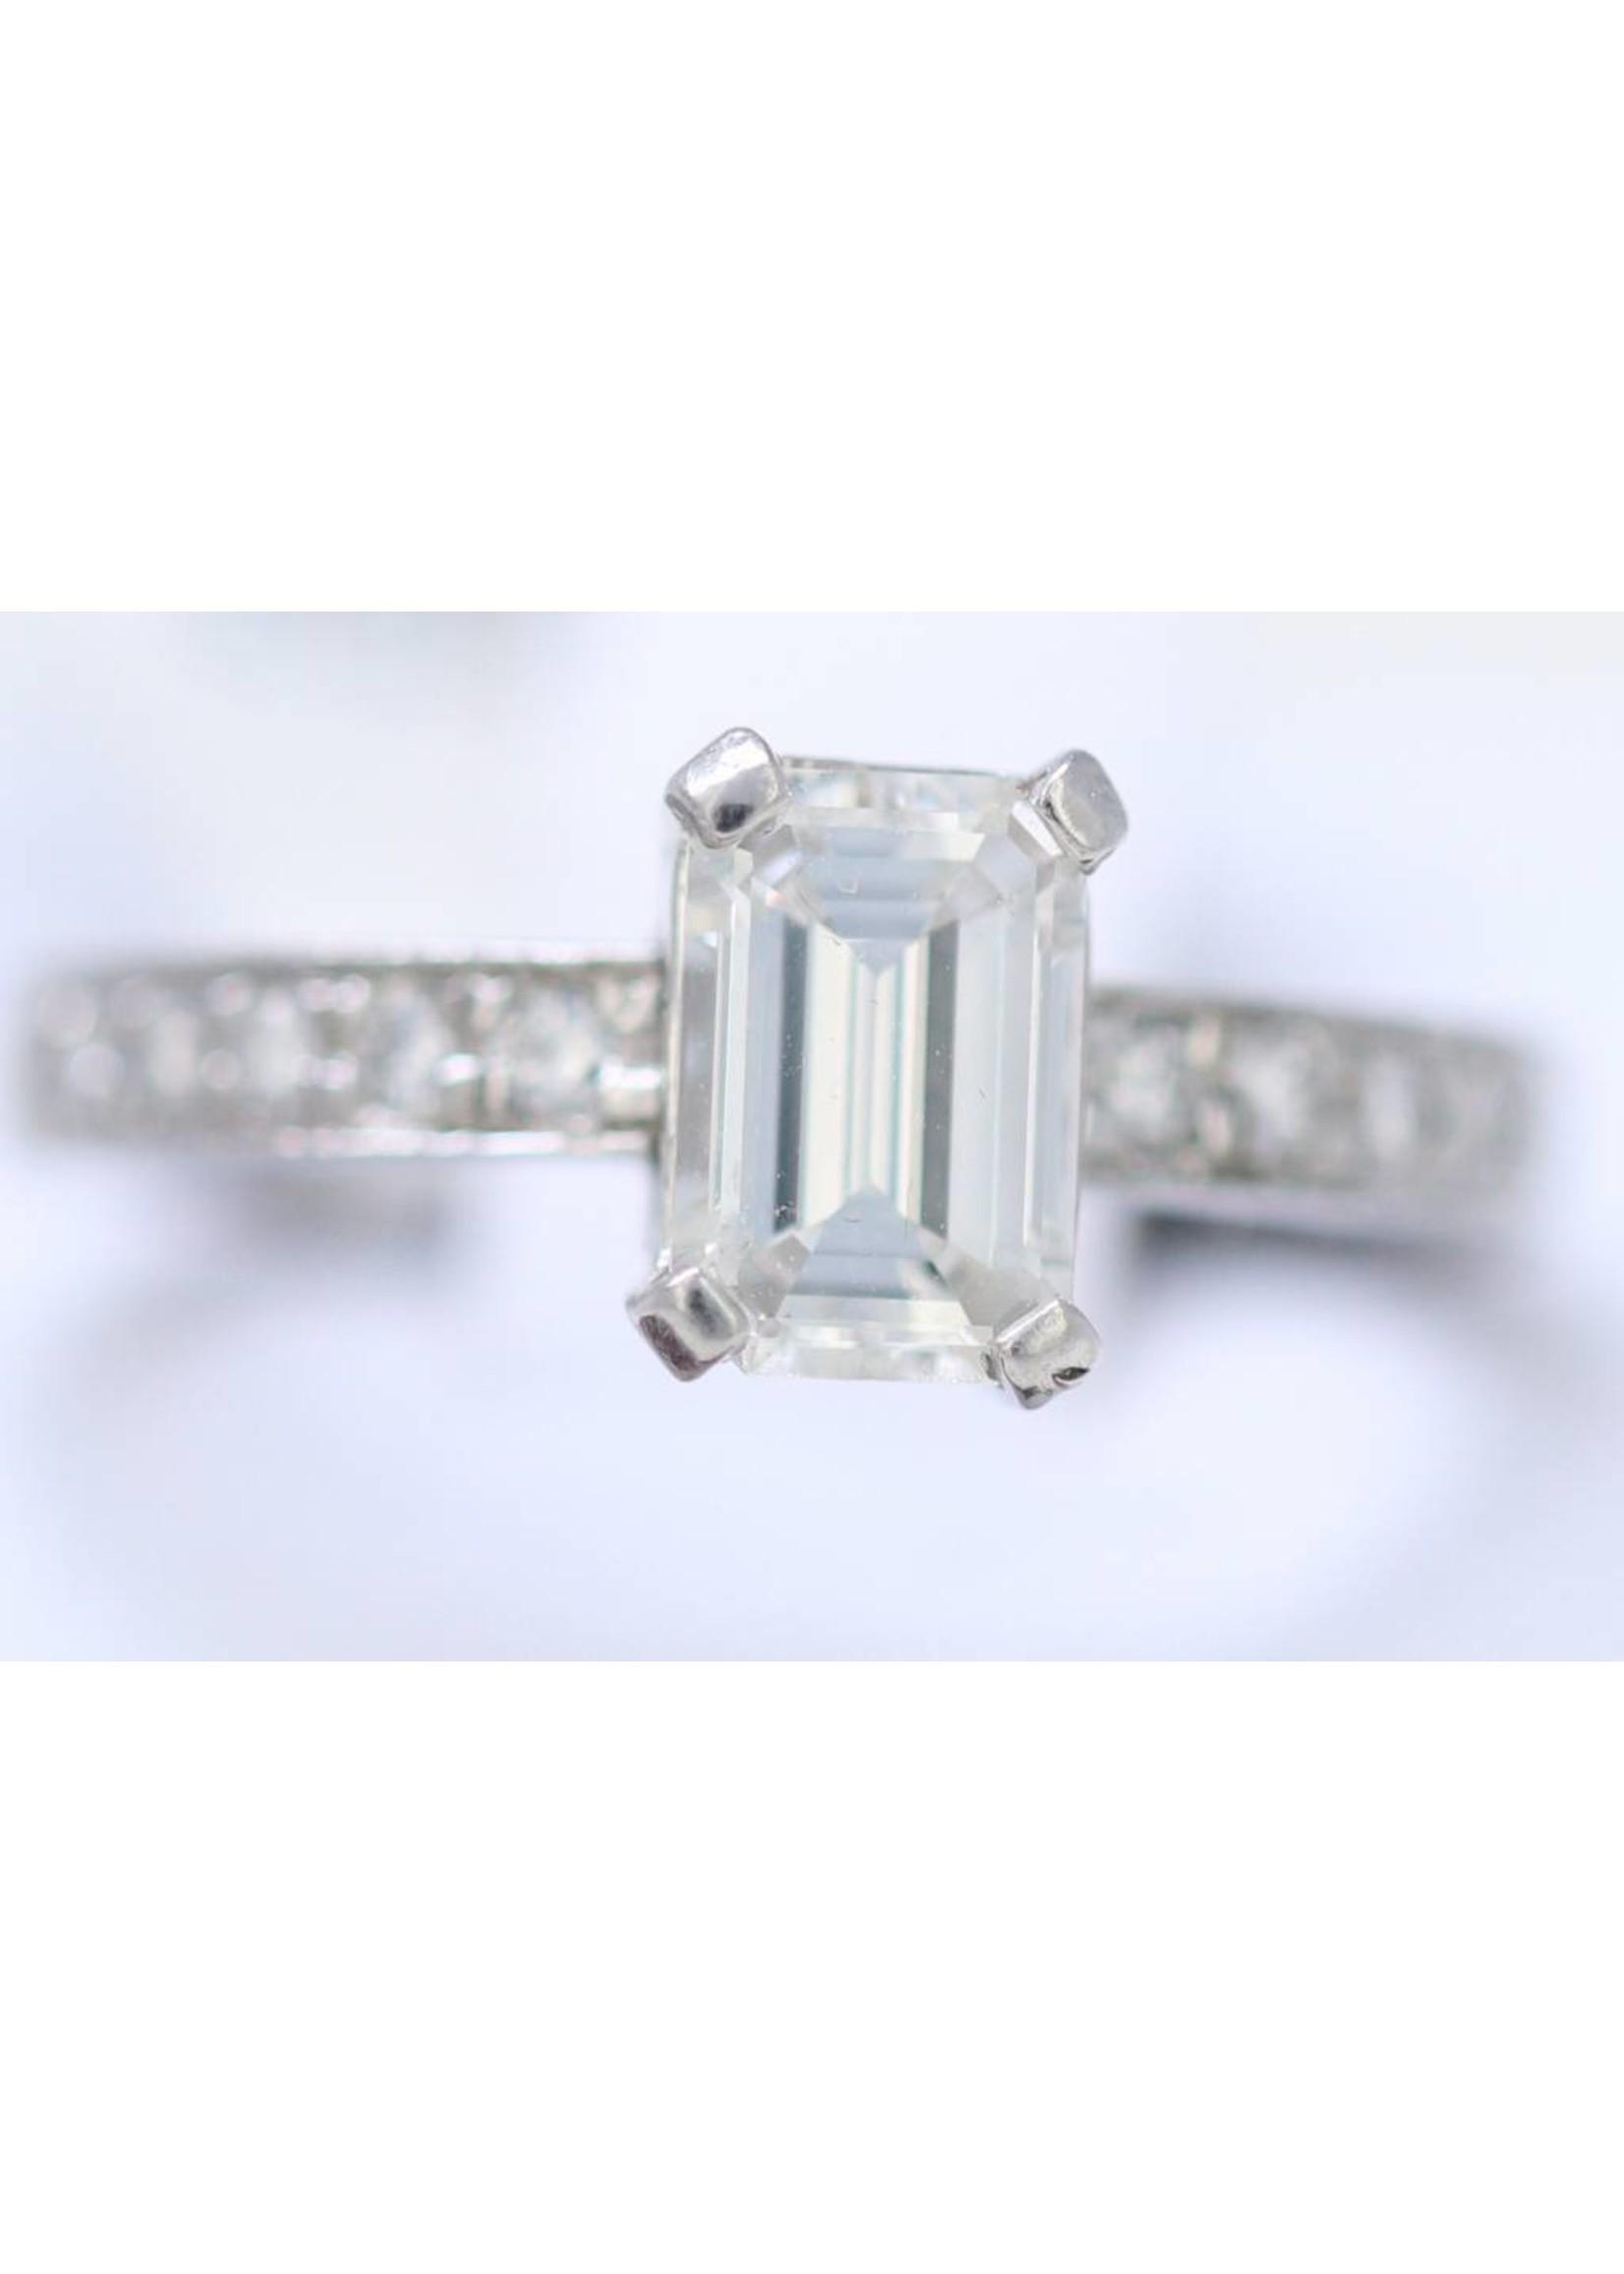 Jewellery PLATINUM EMERALD RING 1.03CT I VI1